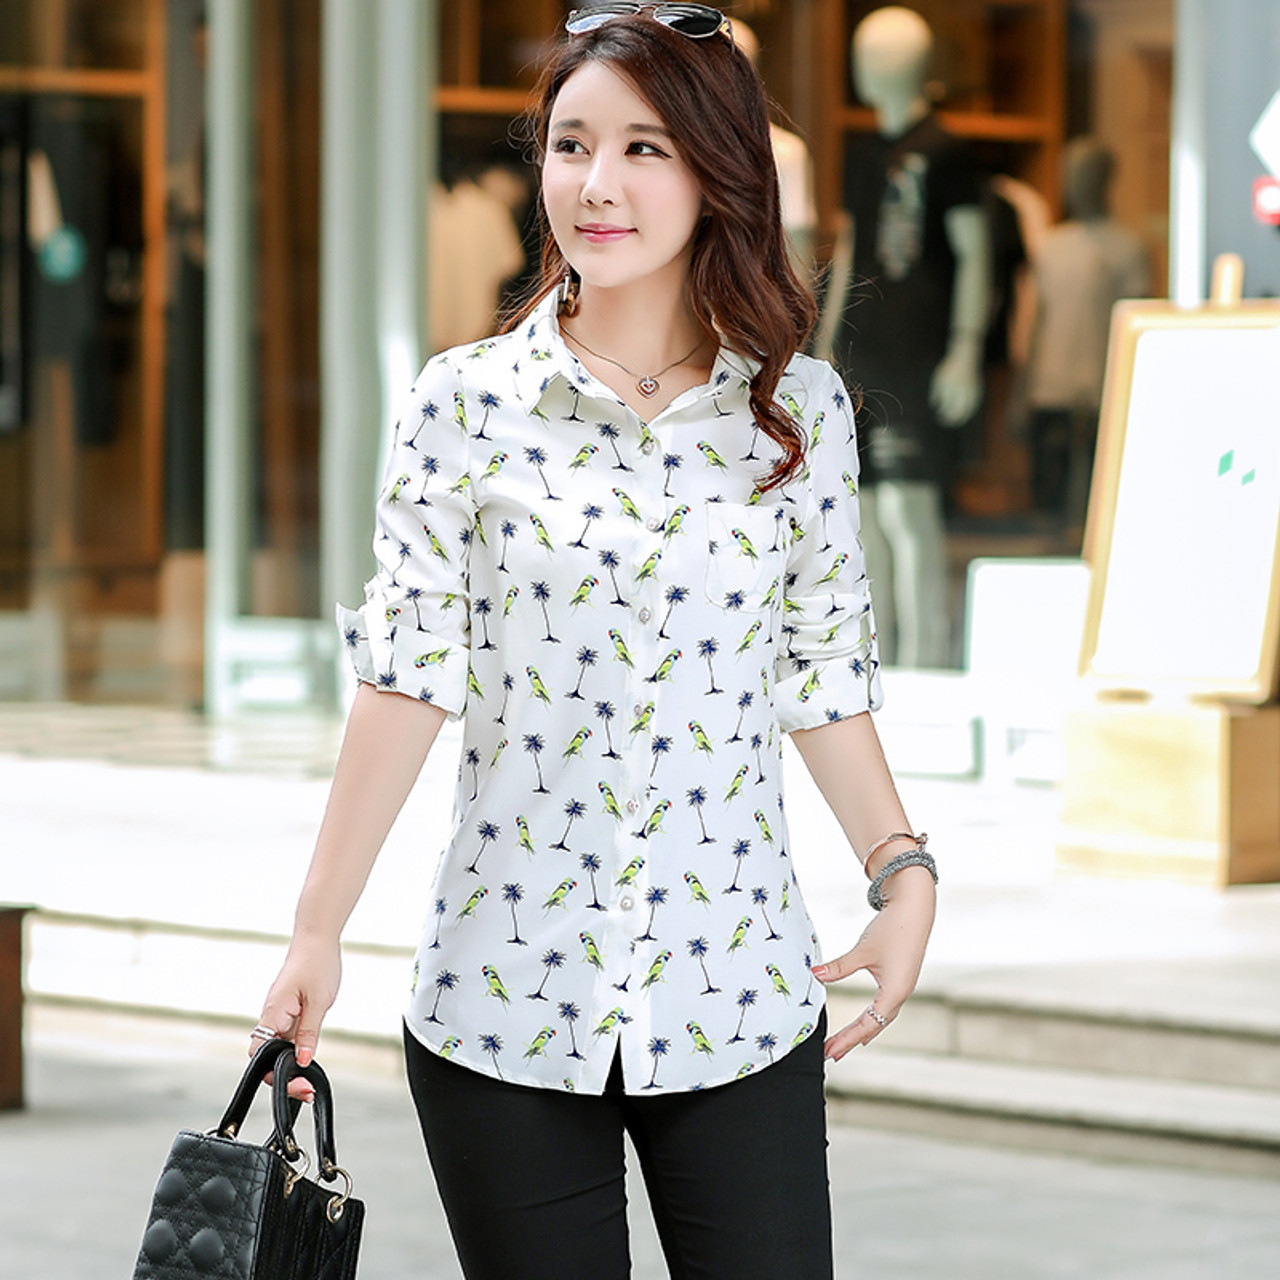 ea4efaa3bcc ... New Fashion Print Blouses Women Long Style Shirts 2018 Cotton Ladies  Tops Long Sleeve Blusas Femininas